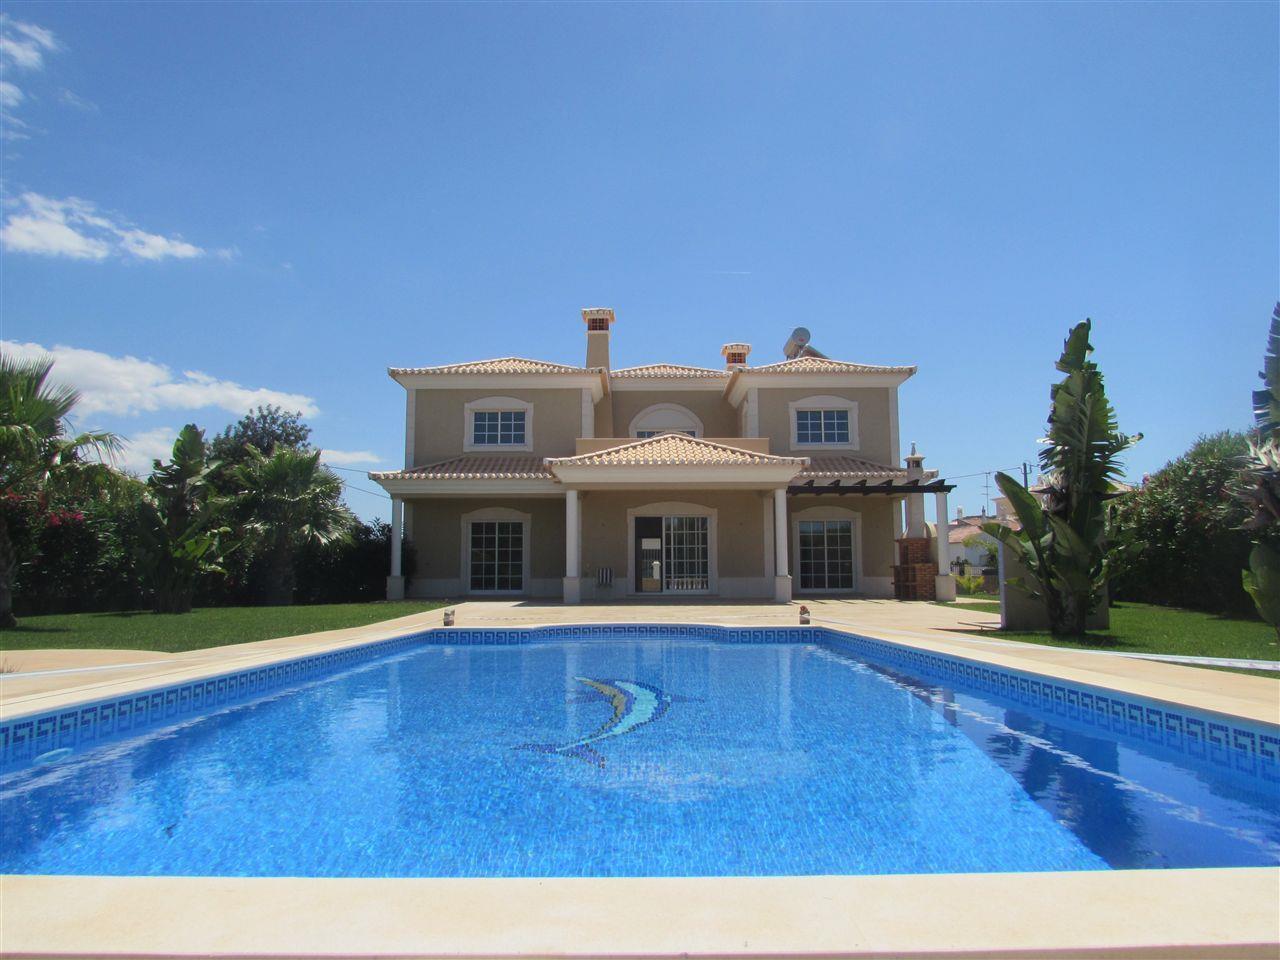 Casa para uma família para Venda às Detached house, 4 bedrooms, for Sale Loule, Algarve Portugal